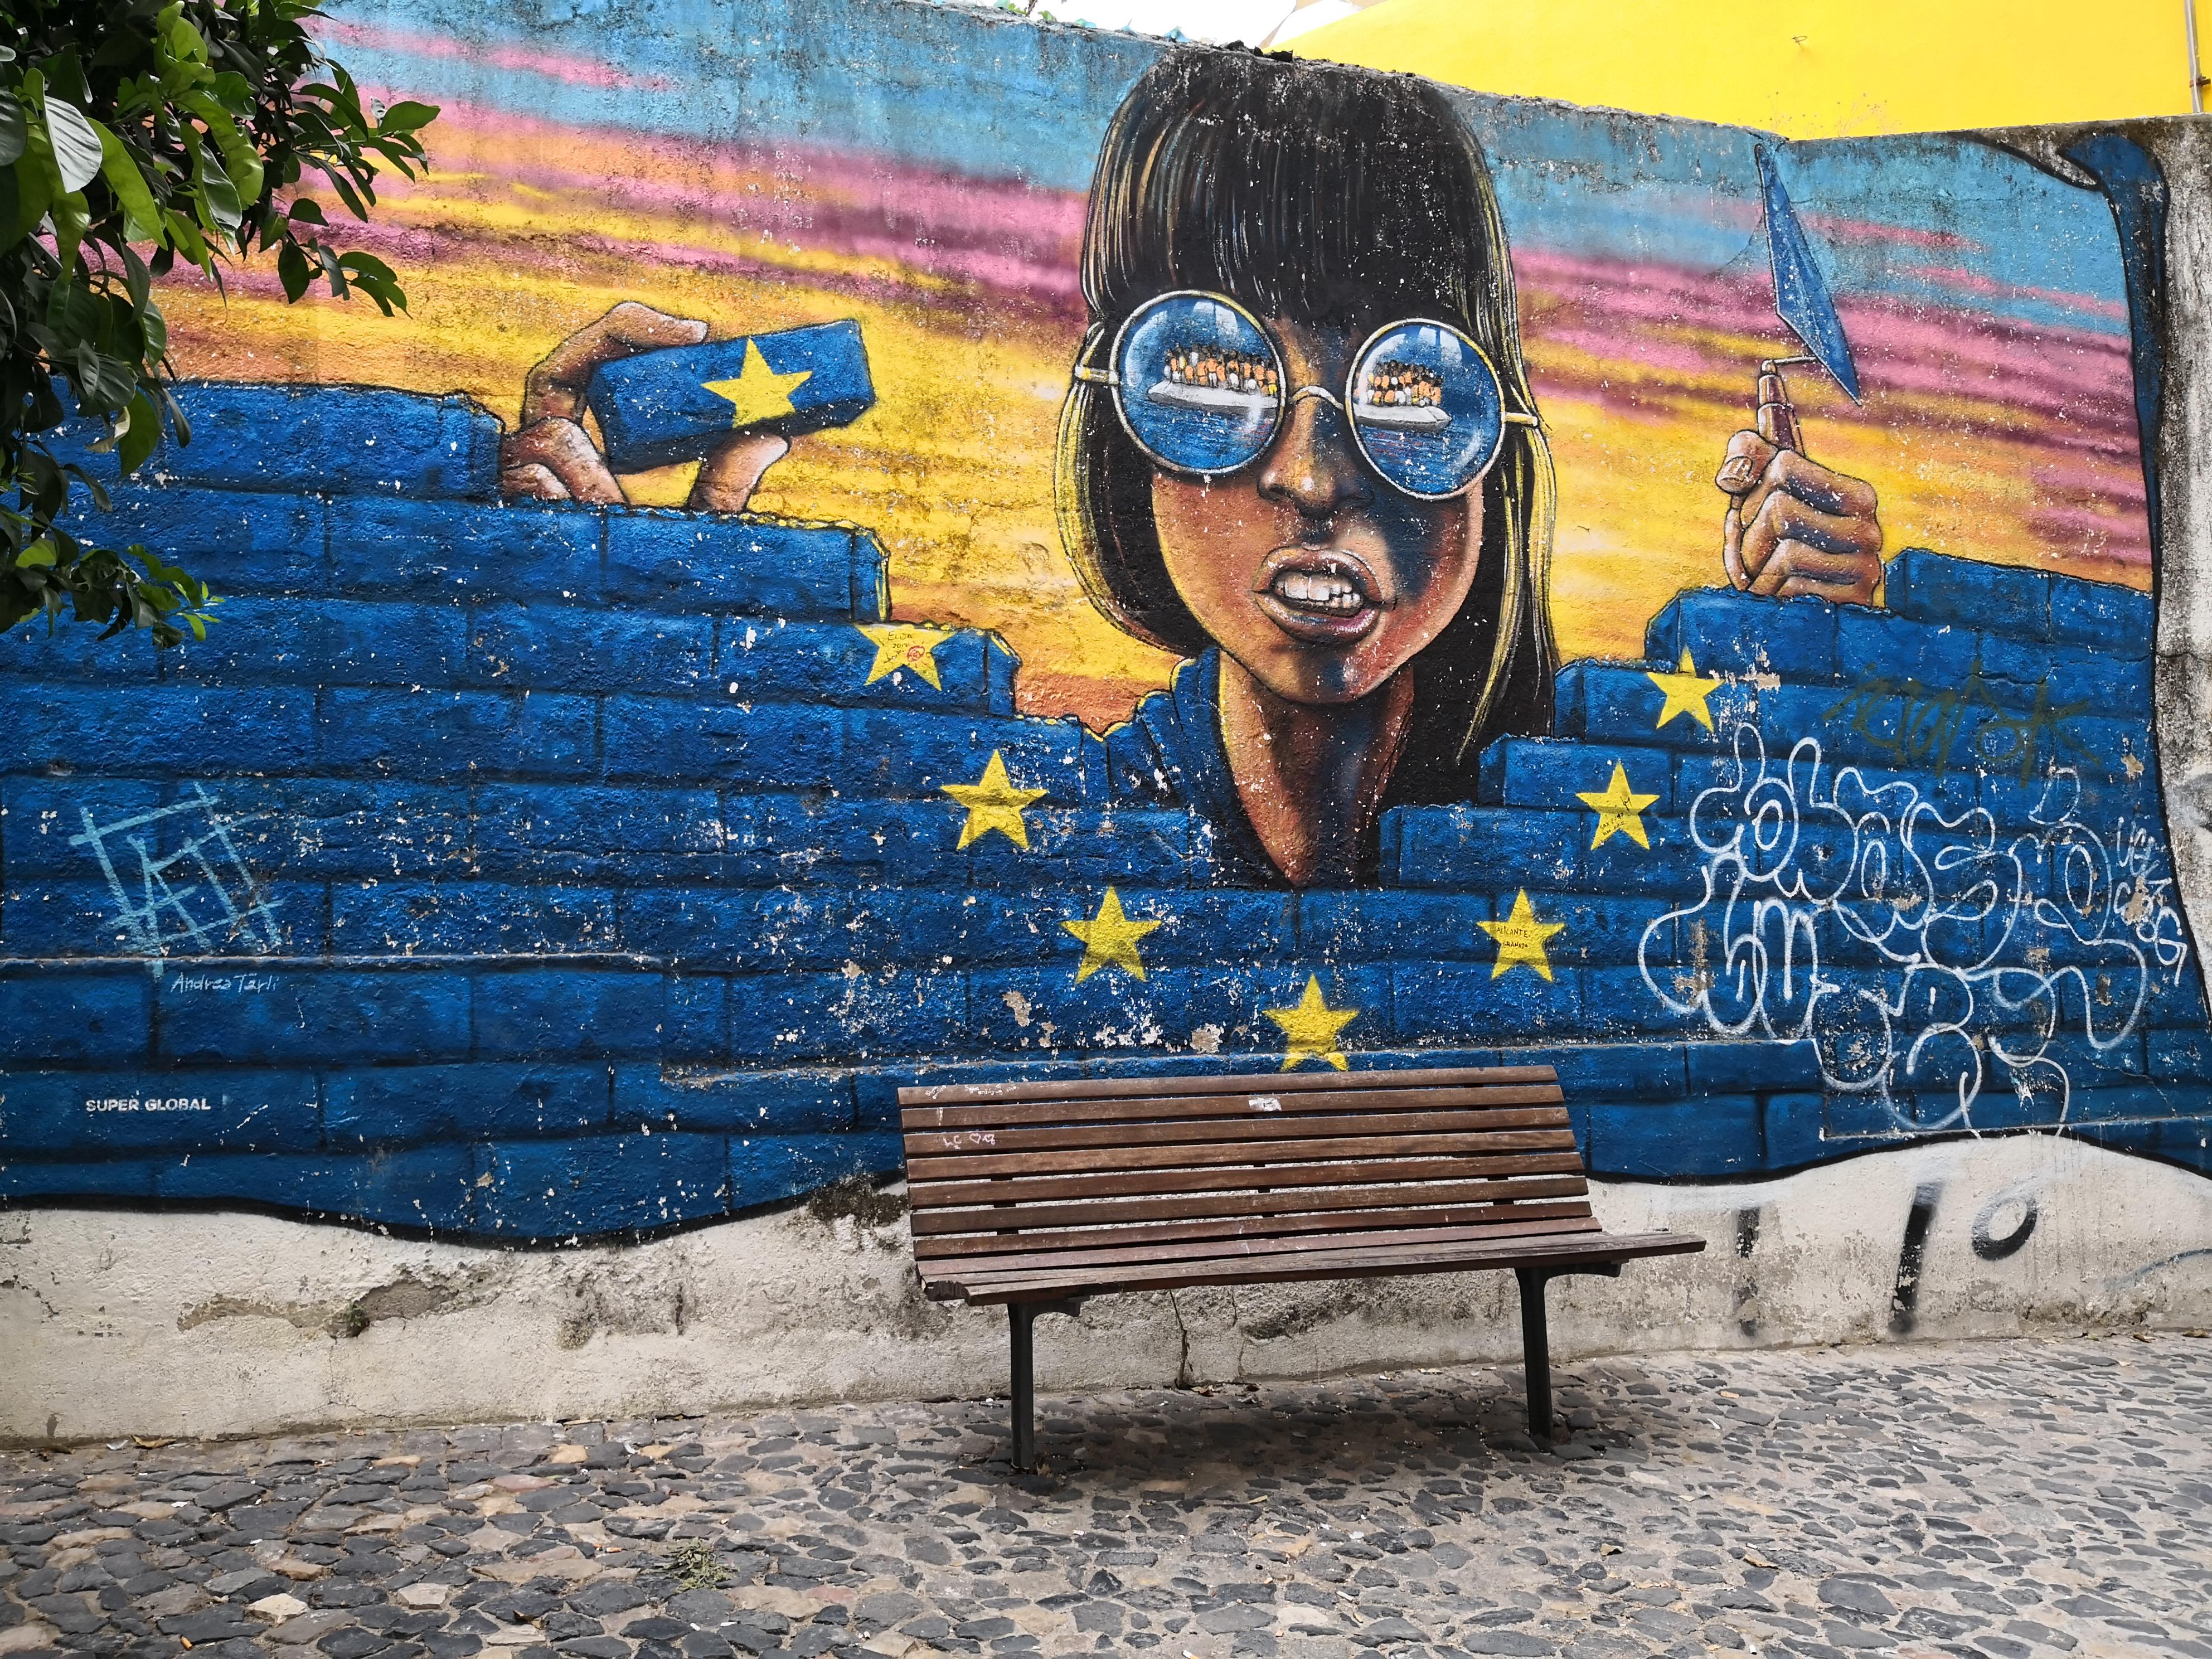 Street Art a Lisbona (Guida con mappa)